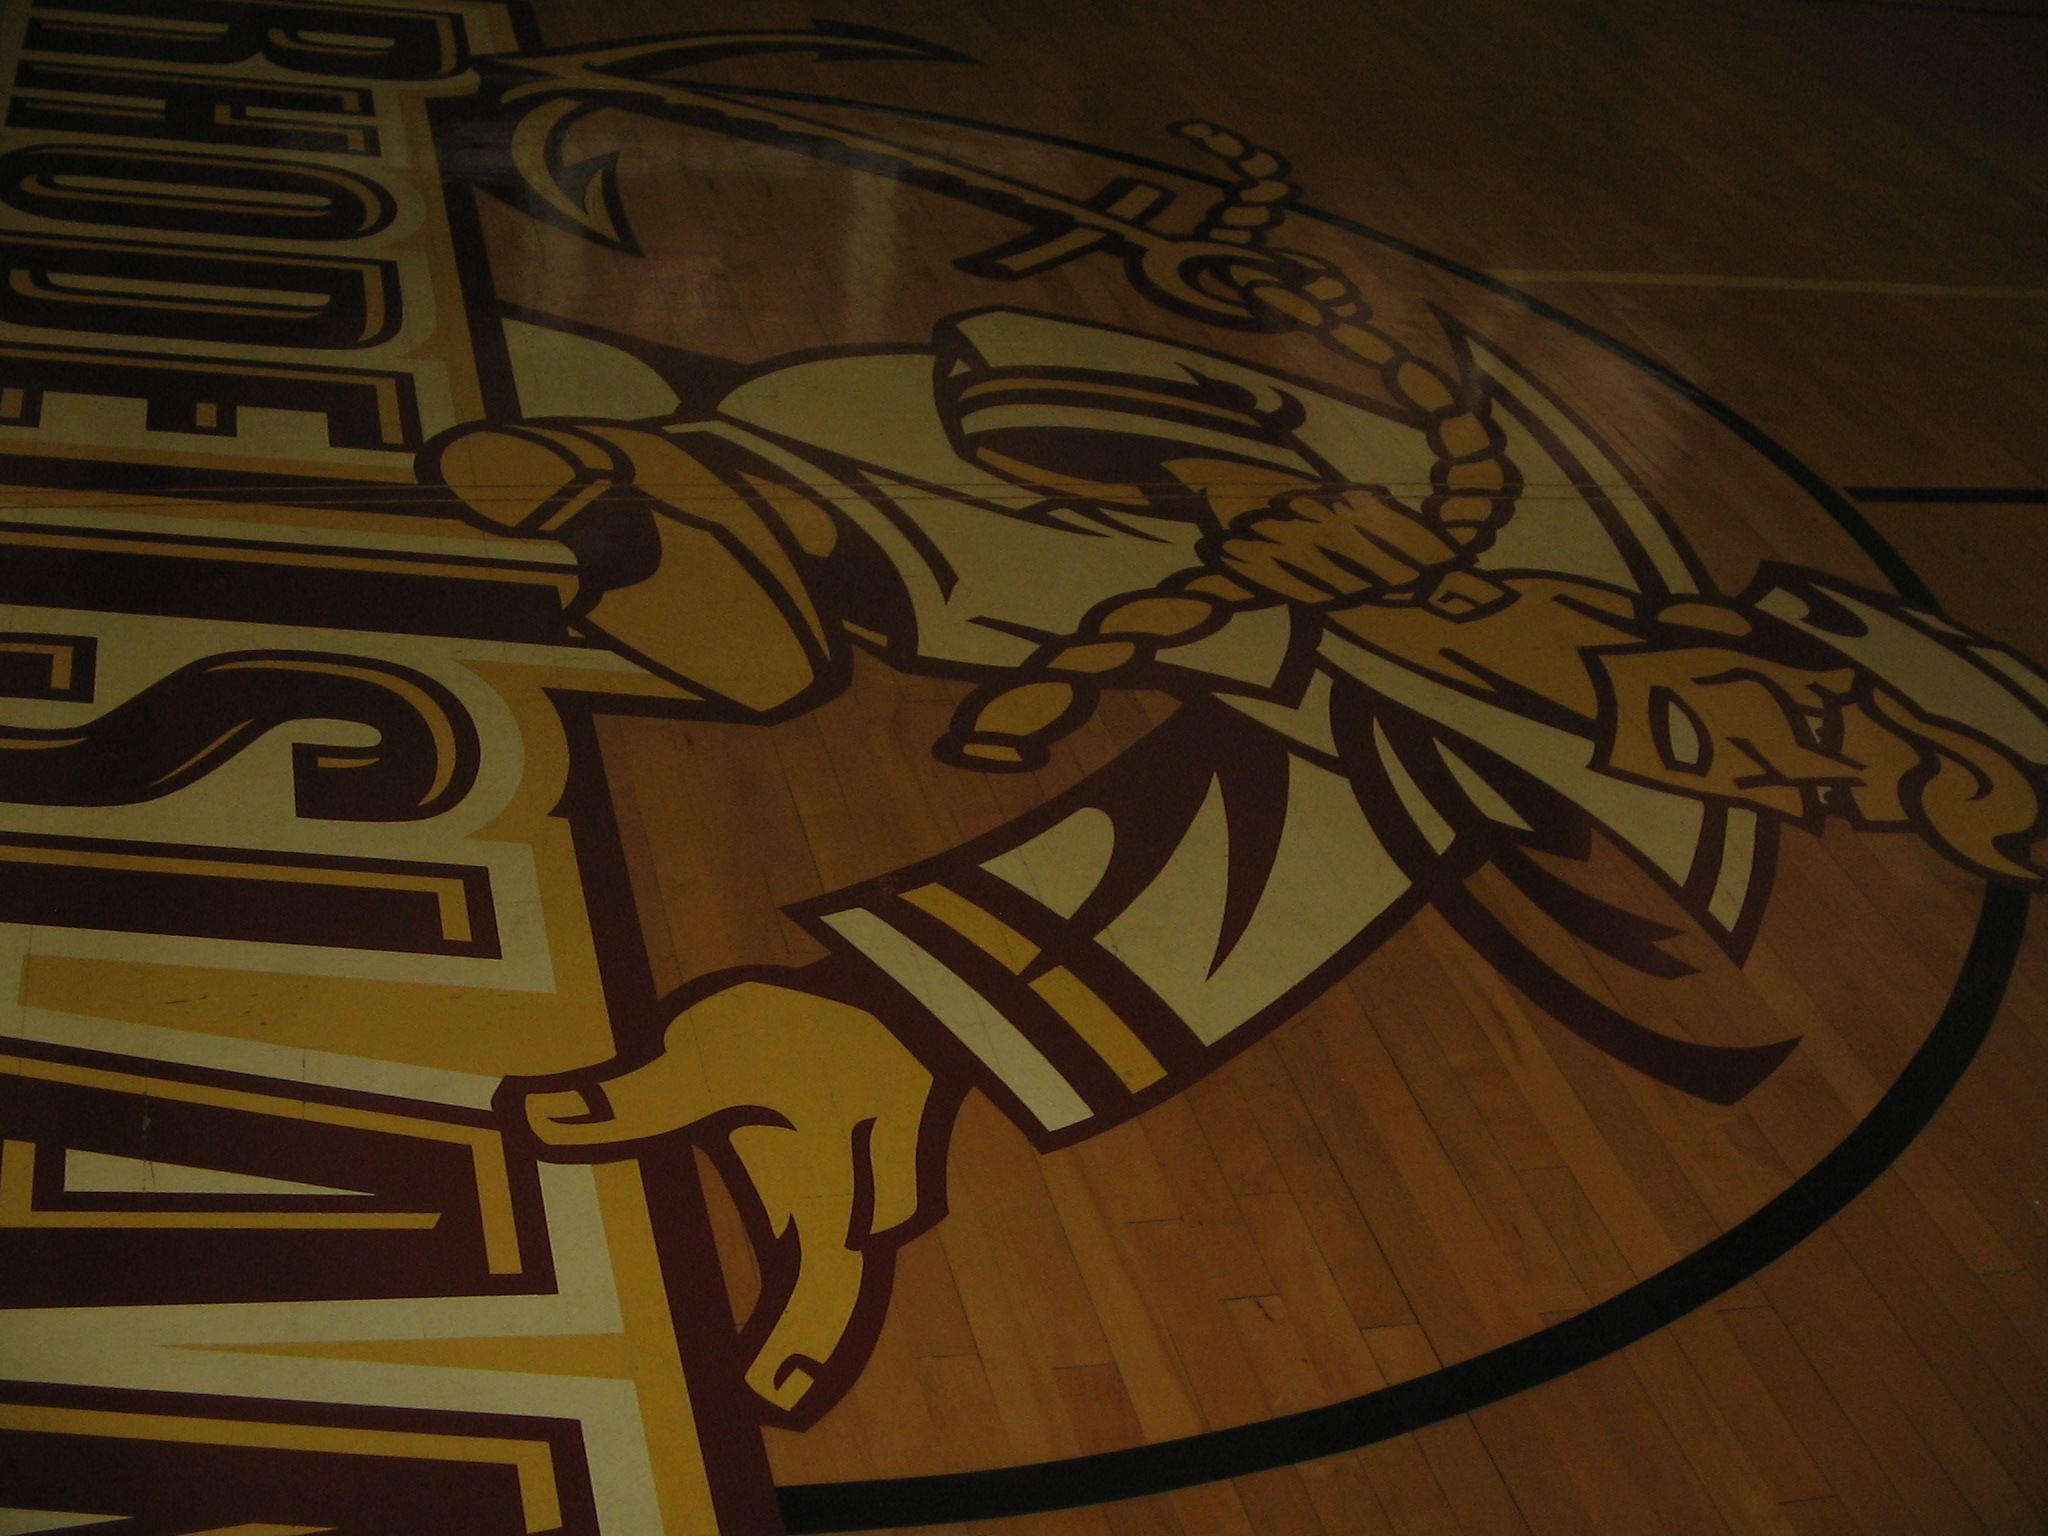 Logo - Sailor - Rhode Island College - Providence RI.JPG